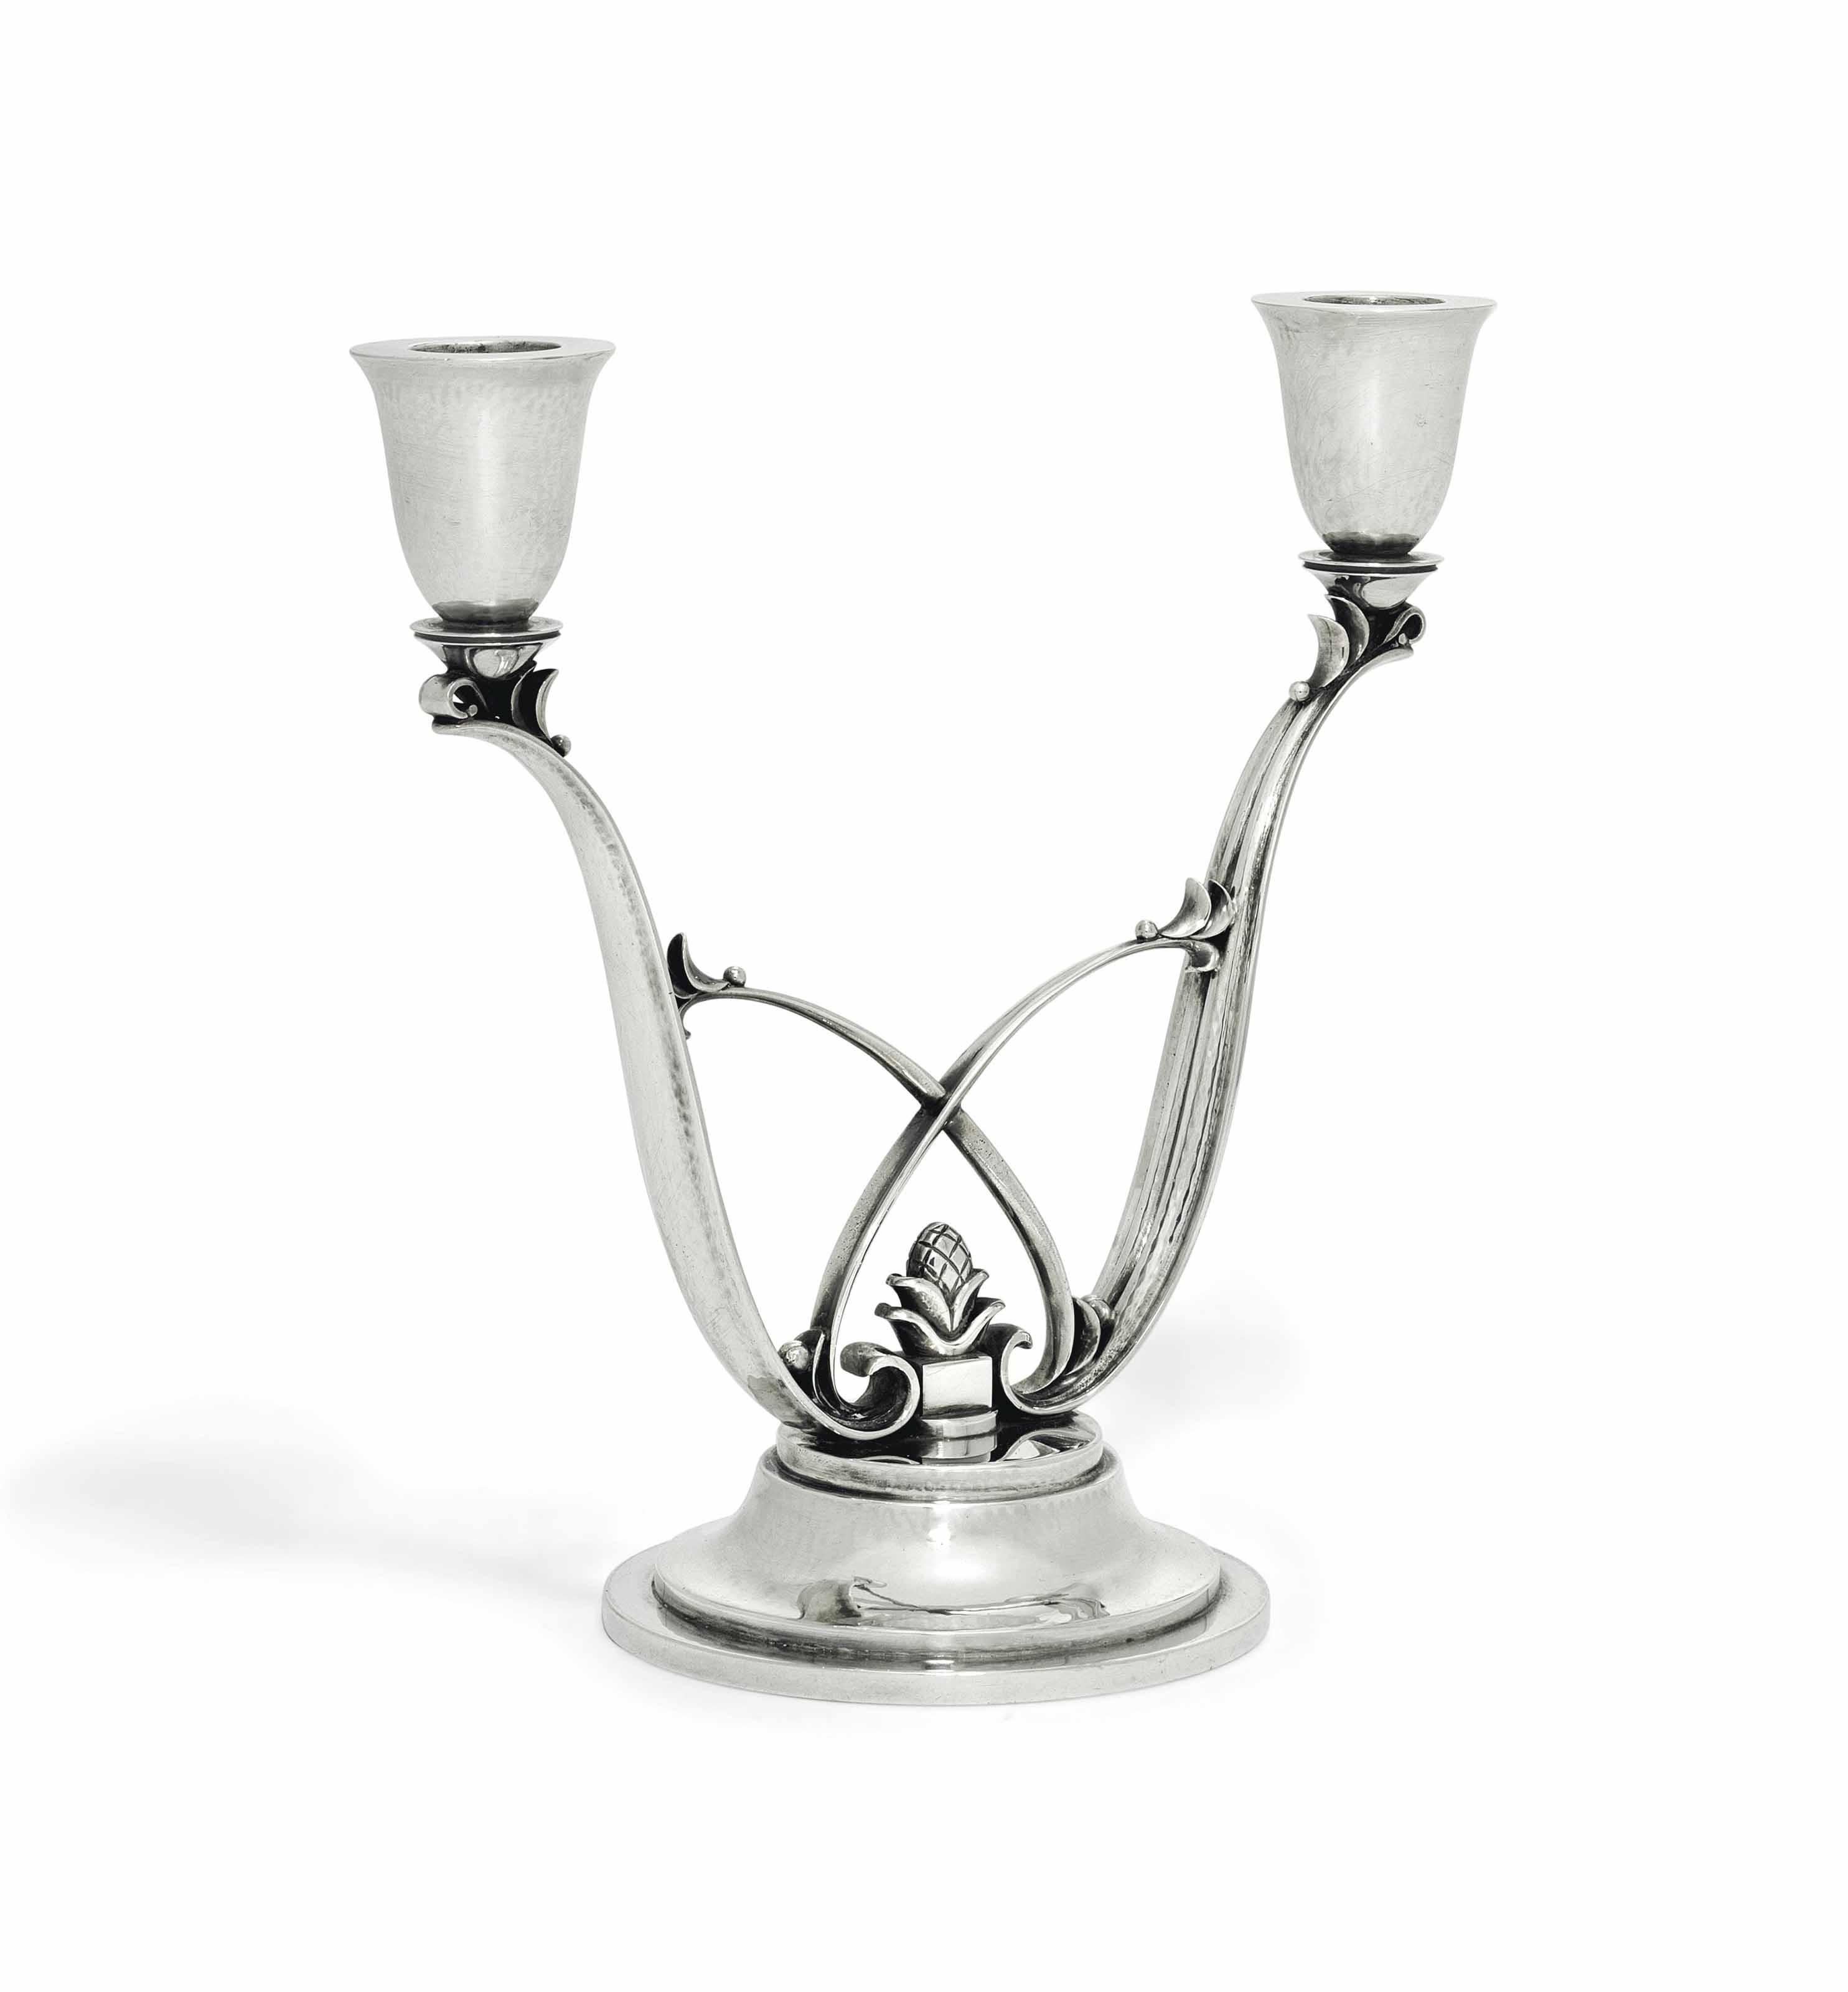 A DANISH TWO-LIGHT CANDELABRUM DESIGNED BY HARALD NIELSEN